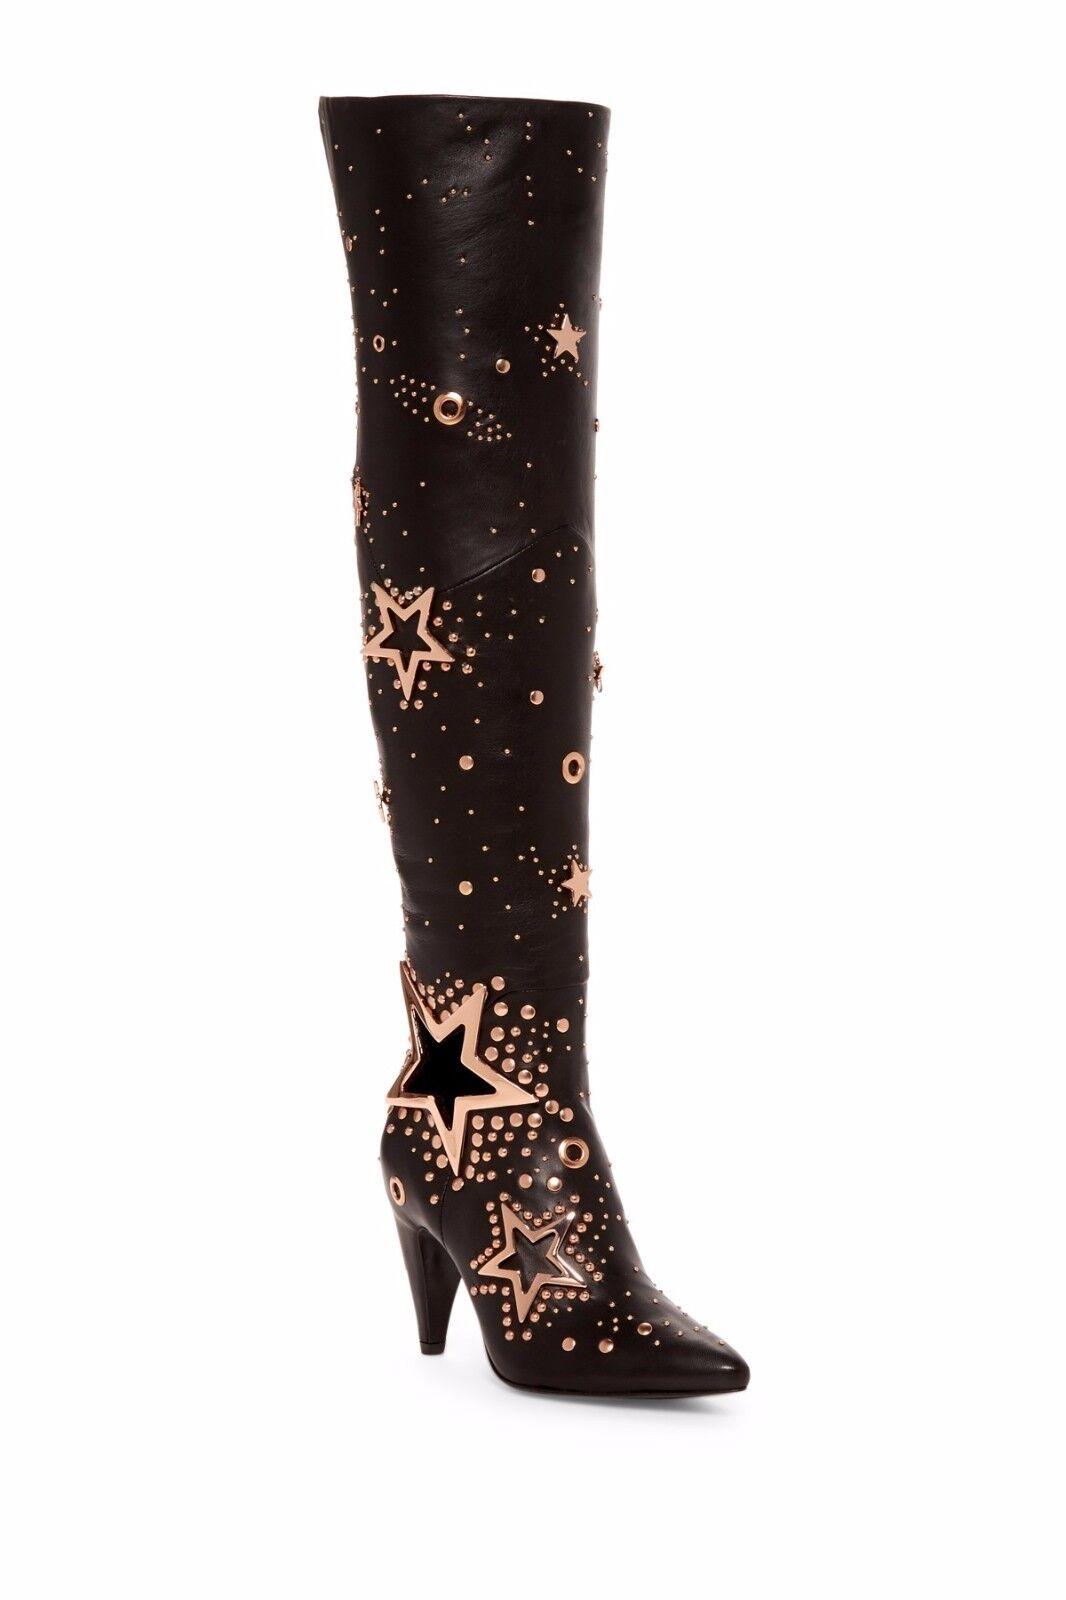 varie dimensioni  995 Ivy Kirzhner Stardust Over-the-Knee Over-the-Knee Over-the-Knee Donna  avvio nero Leather Dimensione 6  qualità garantita